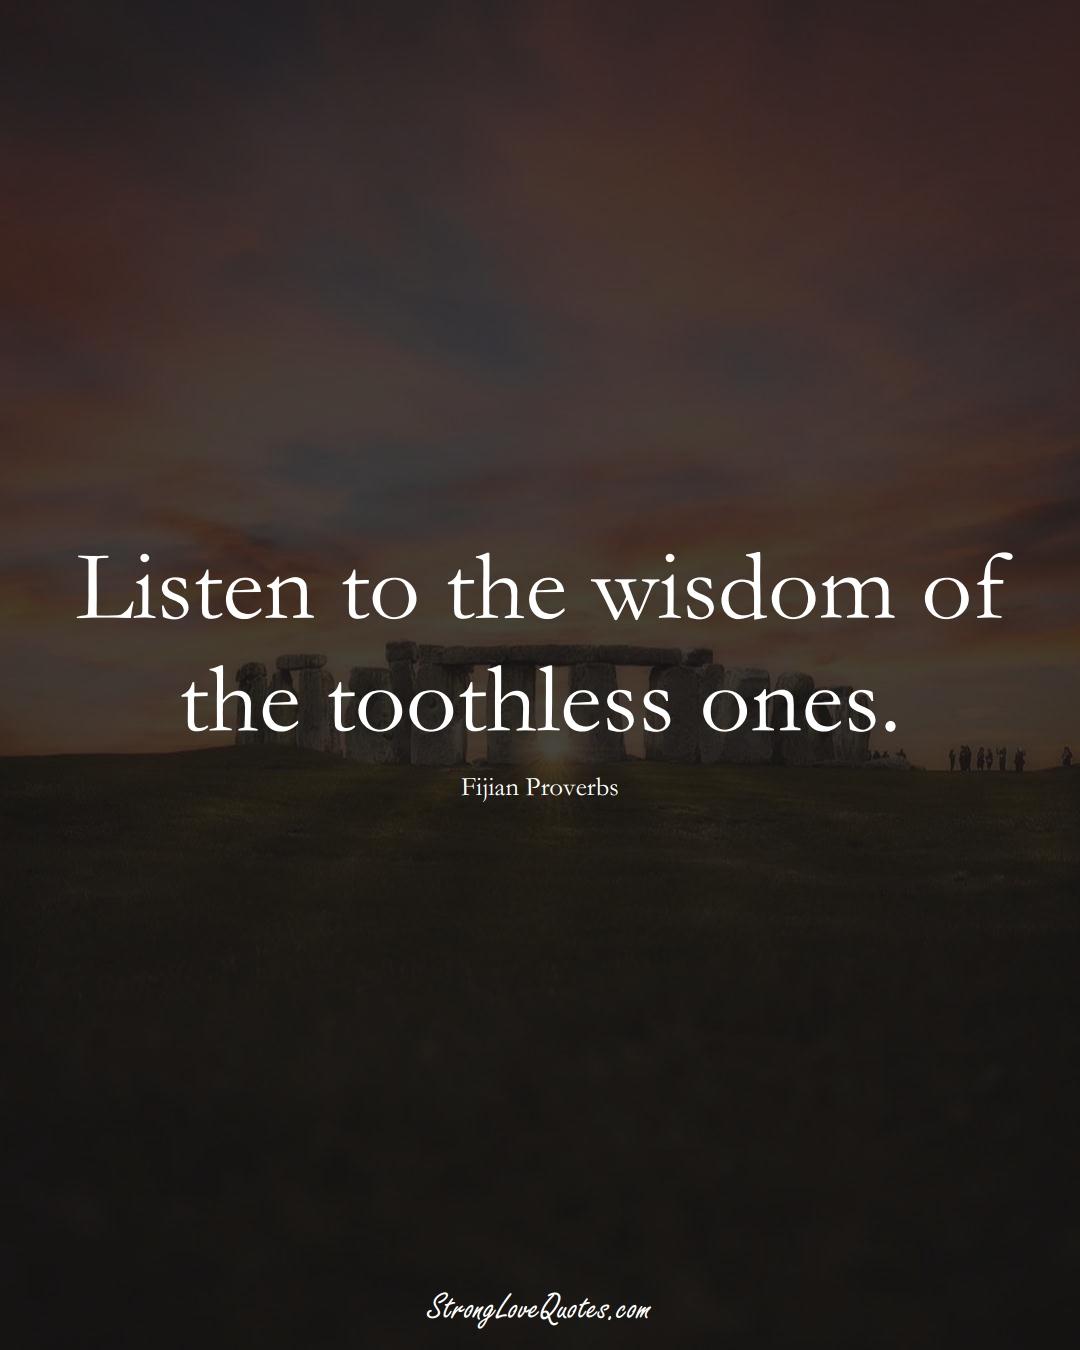 Listen to the wisdom of the toothless ones. (Fijian Sayings);  #AustralianSayings